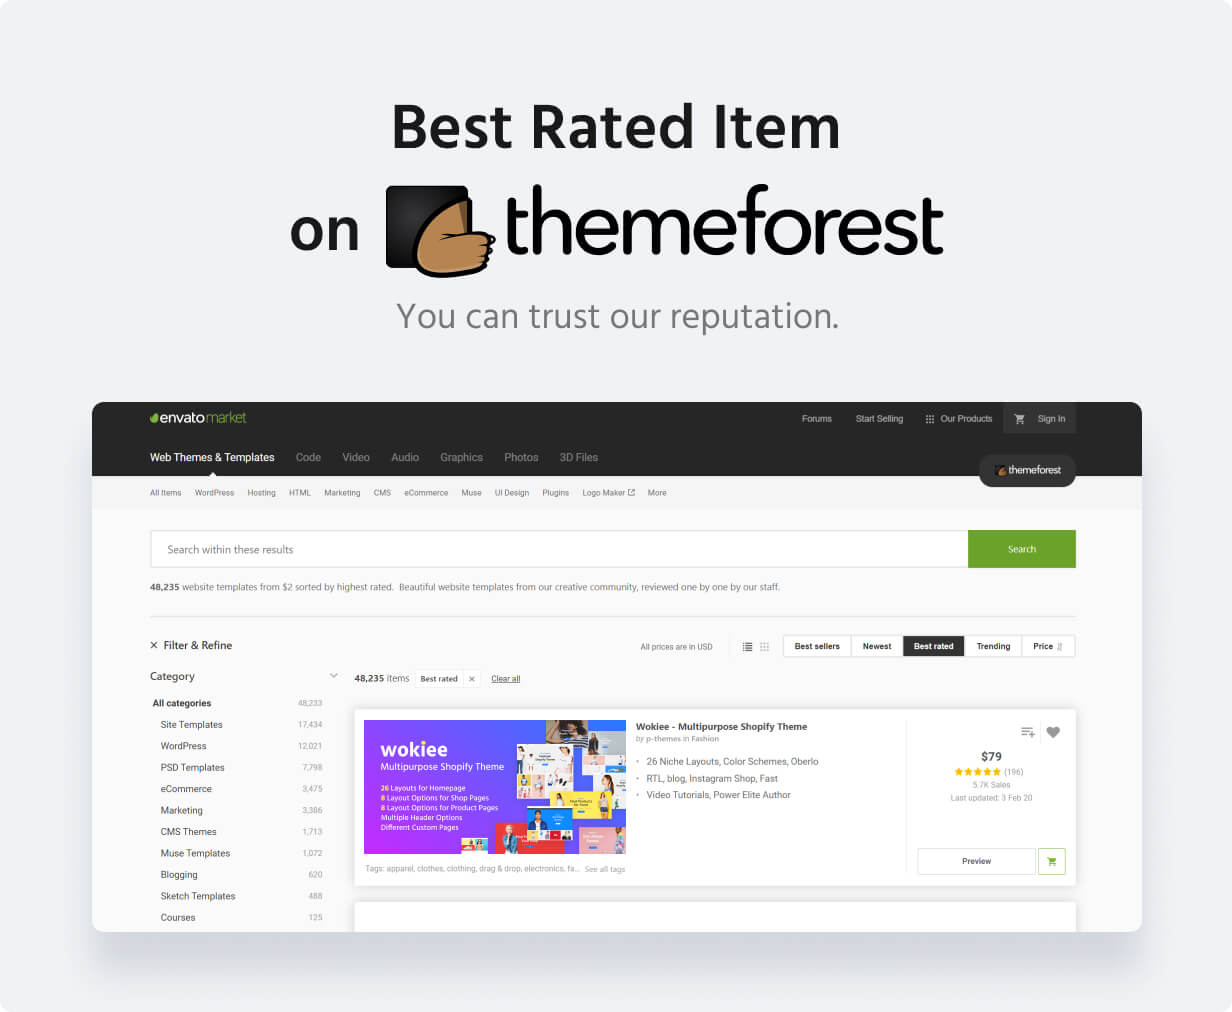 Wokiee - Multipurpose Shopify Theme - 8